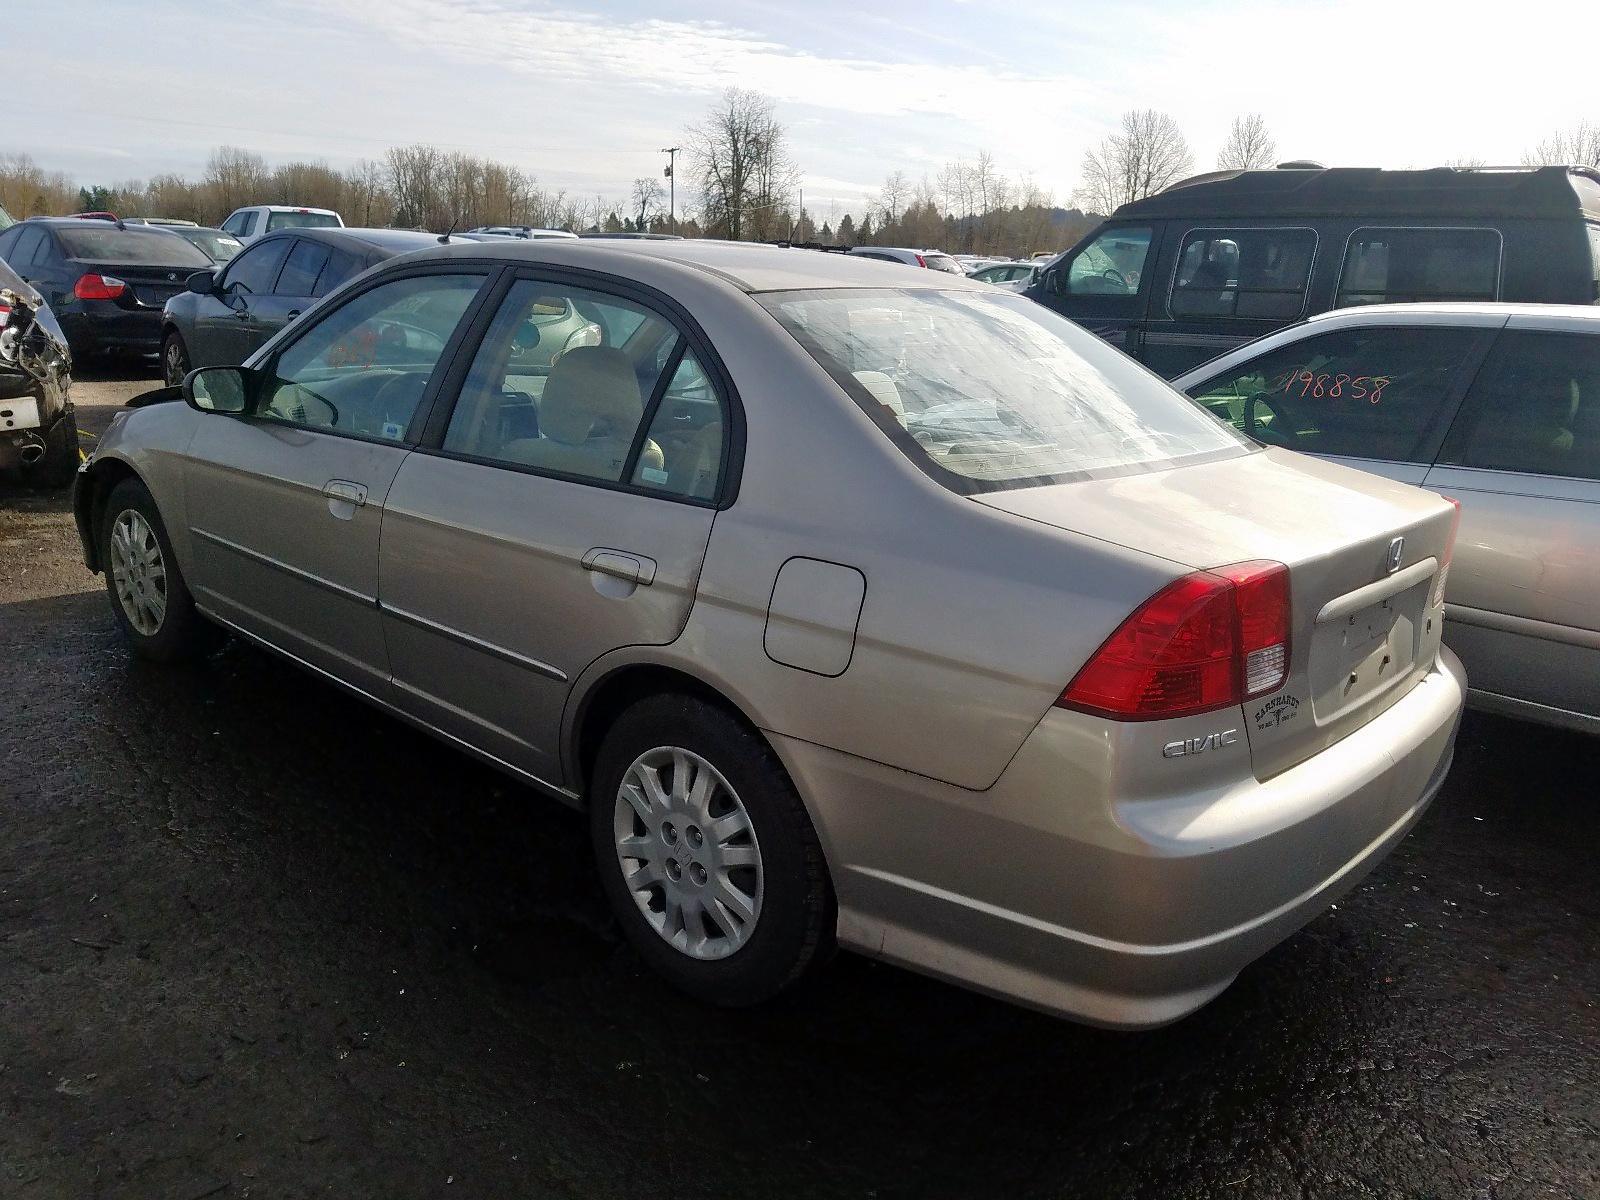 1HGES165X5L030512 - 2005 Honda Civic Lx 1.7L [Angle] View